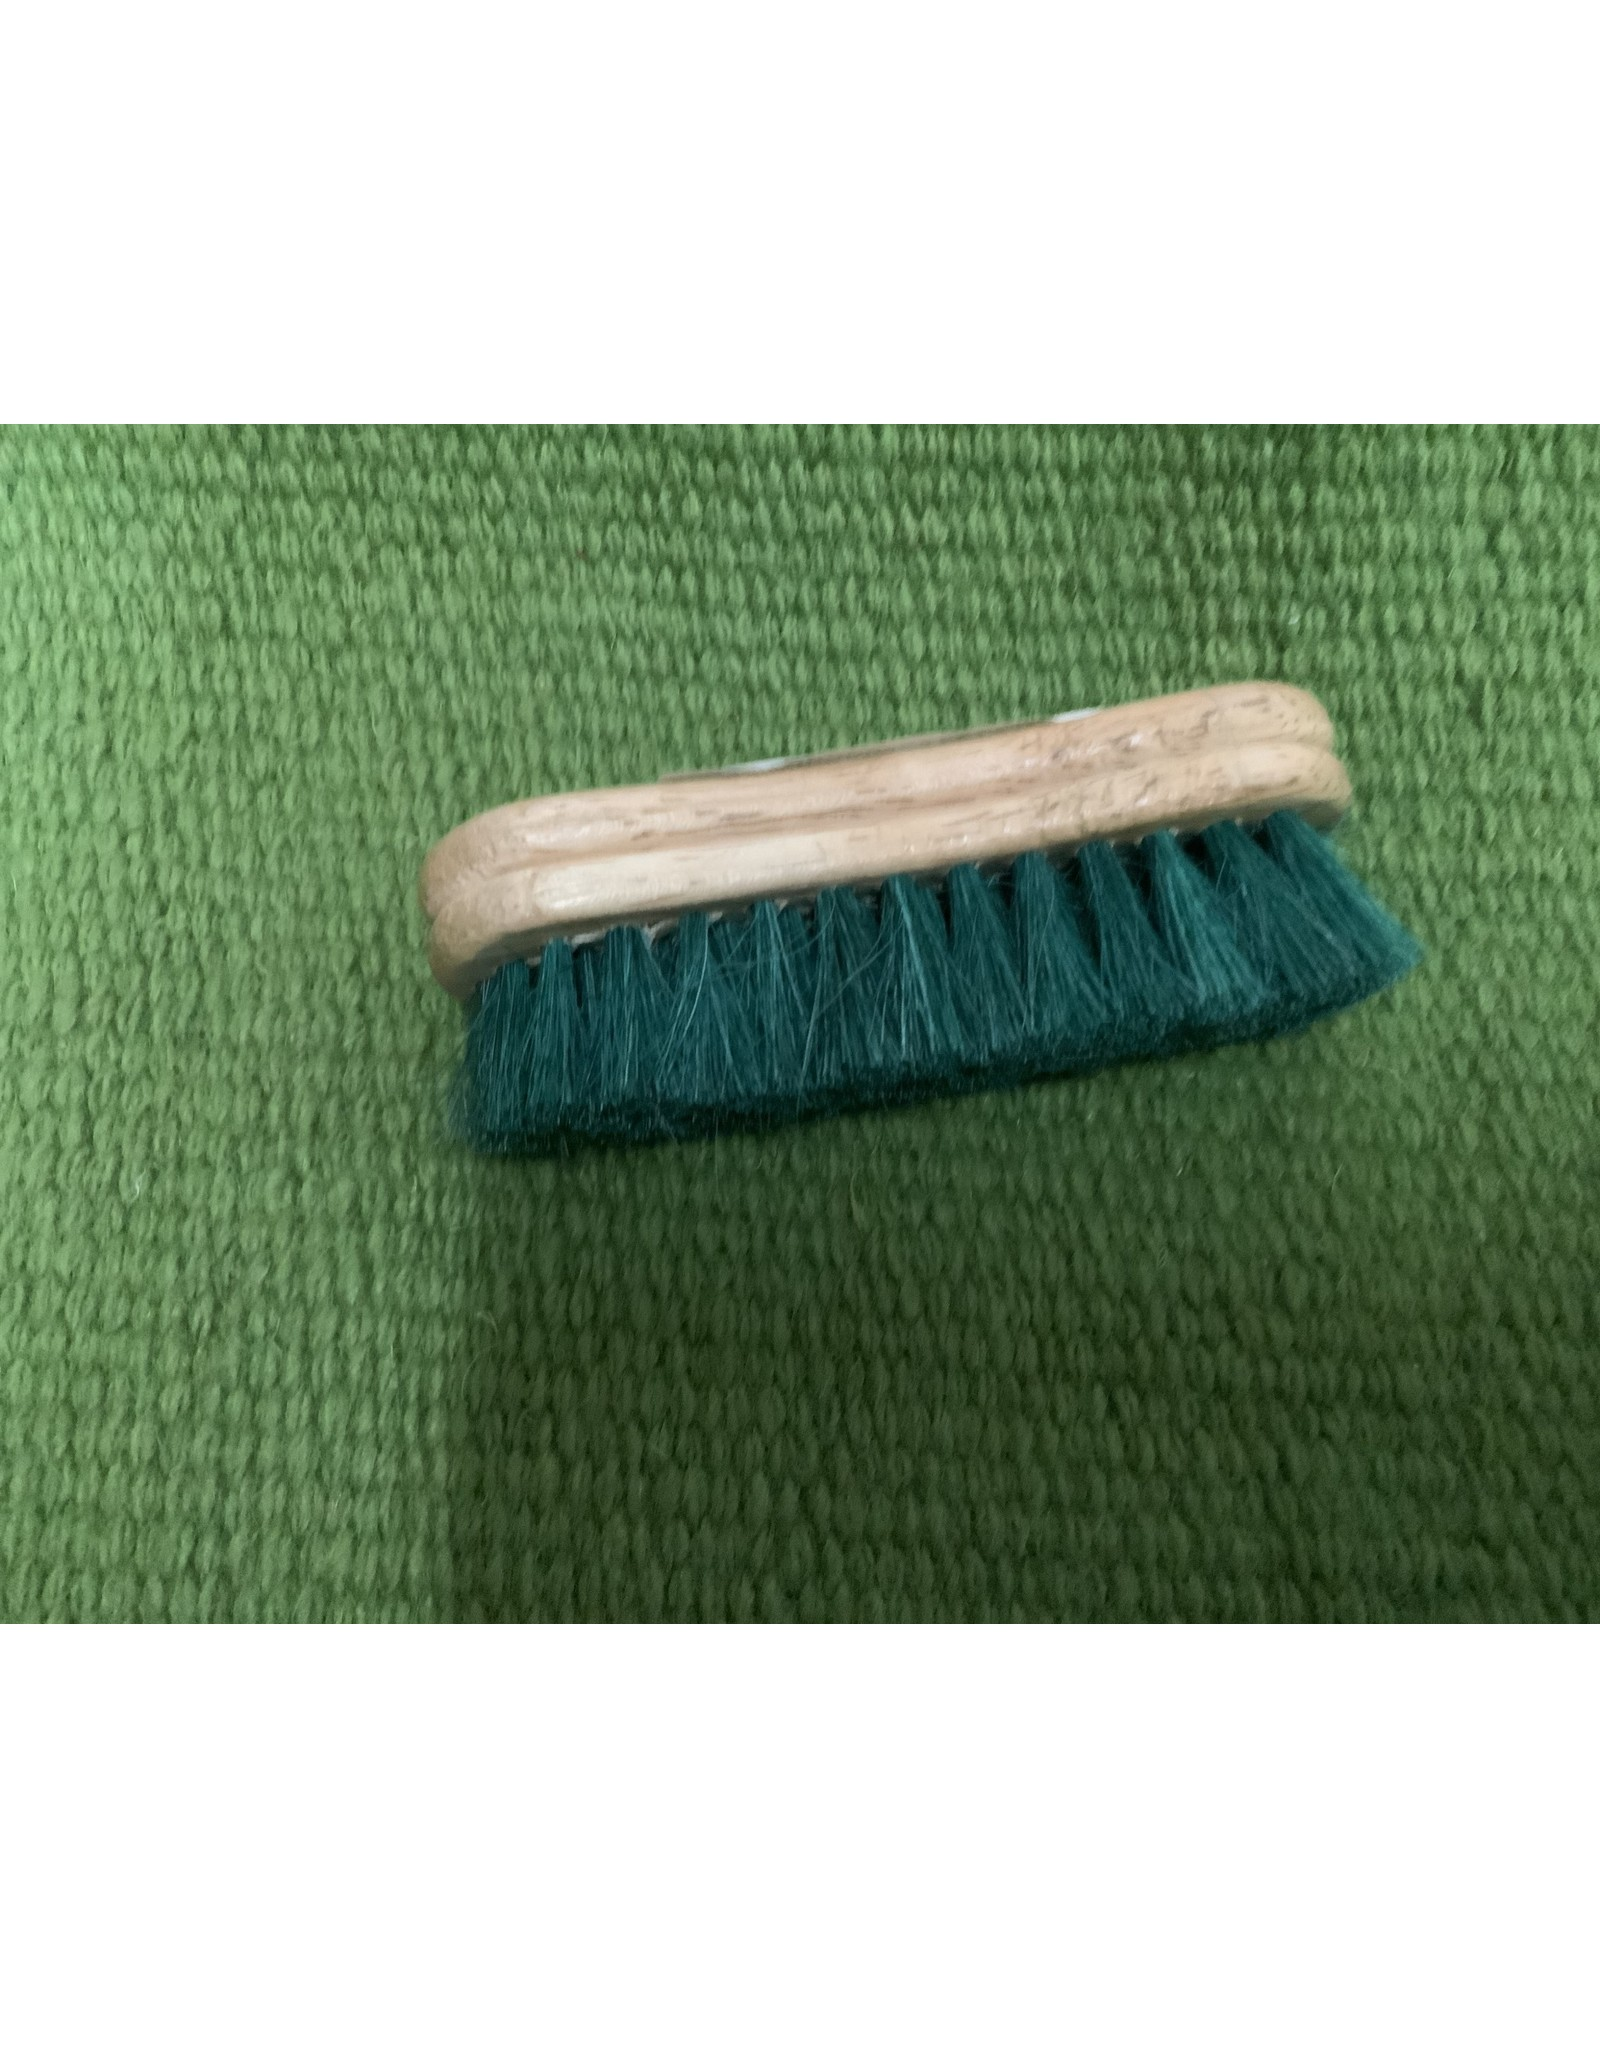 Brush Face Peanut Shaped 844-009 box of 12 *9999P